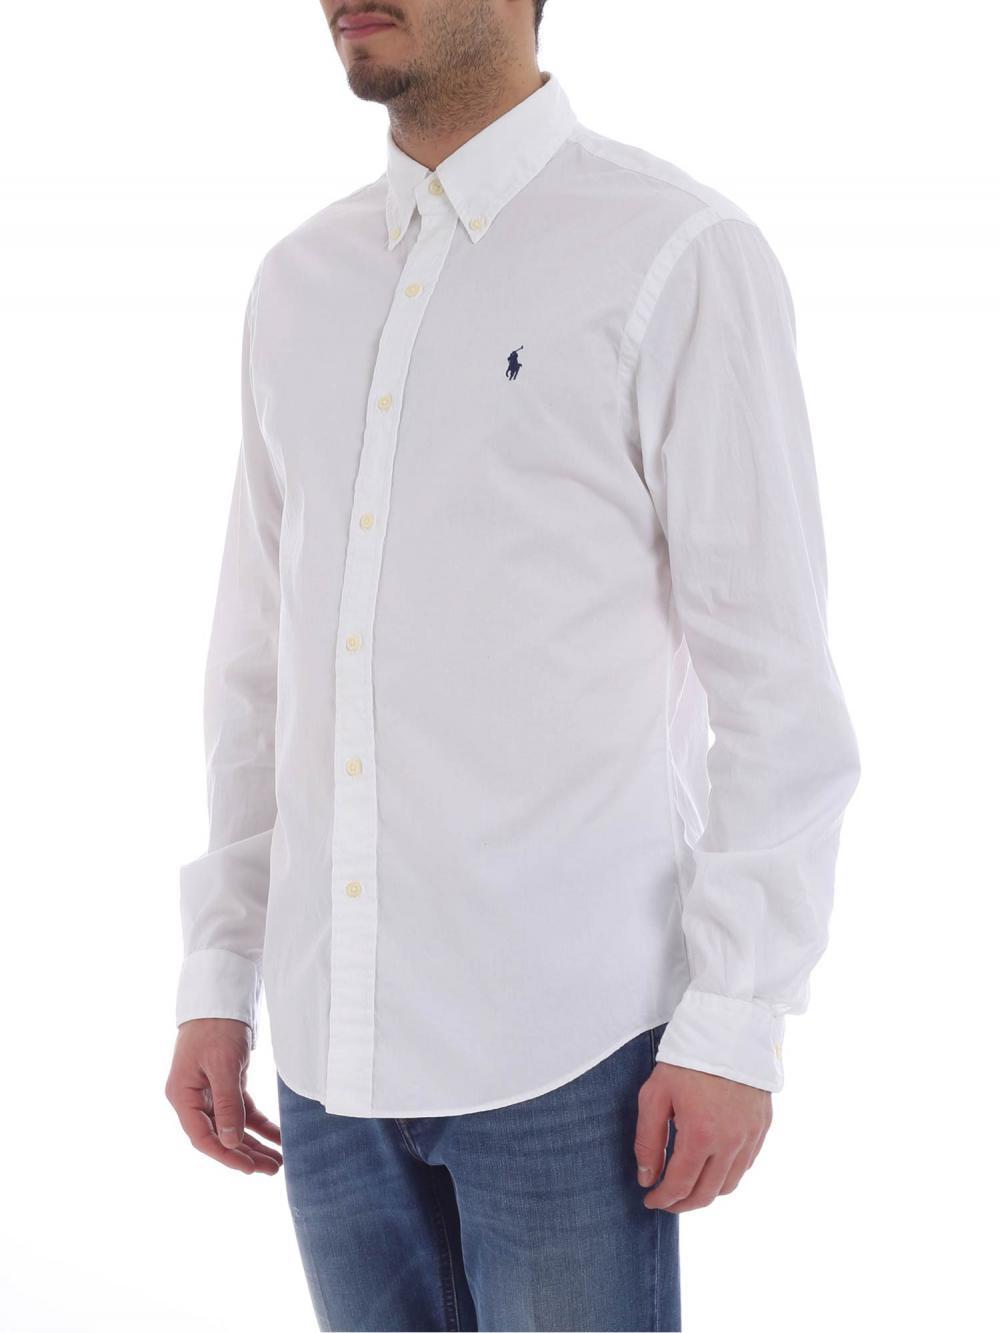 blouse-ralph-lauren-cod-710741788